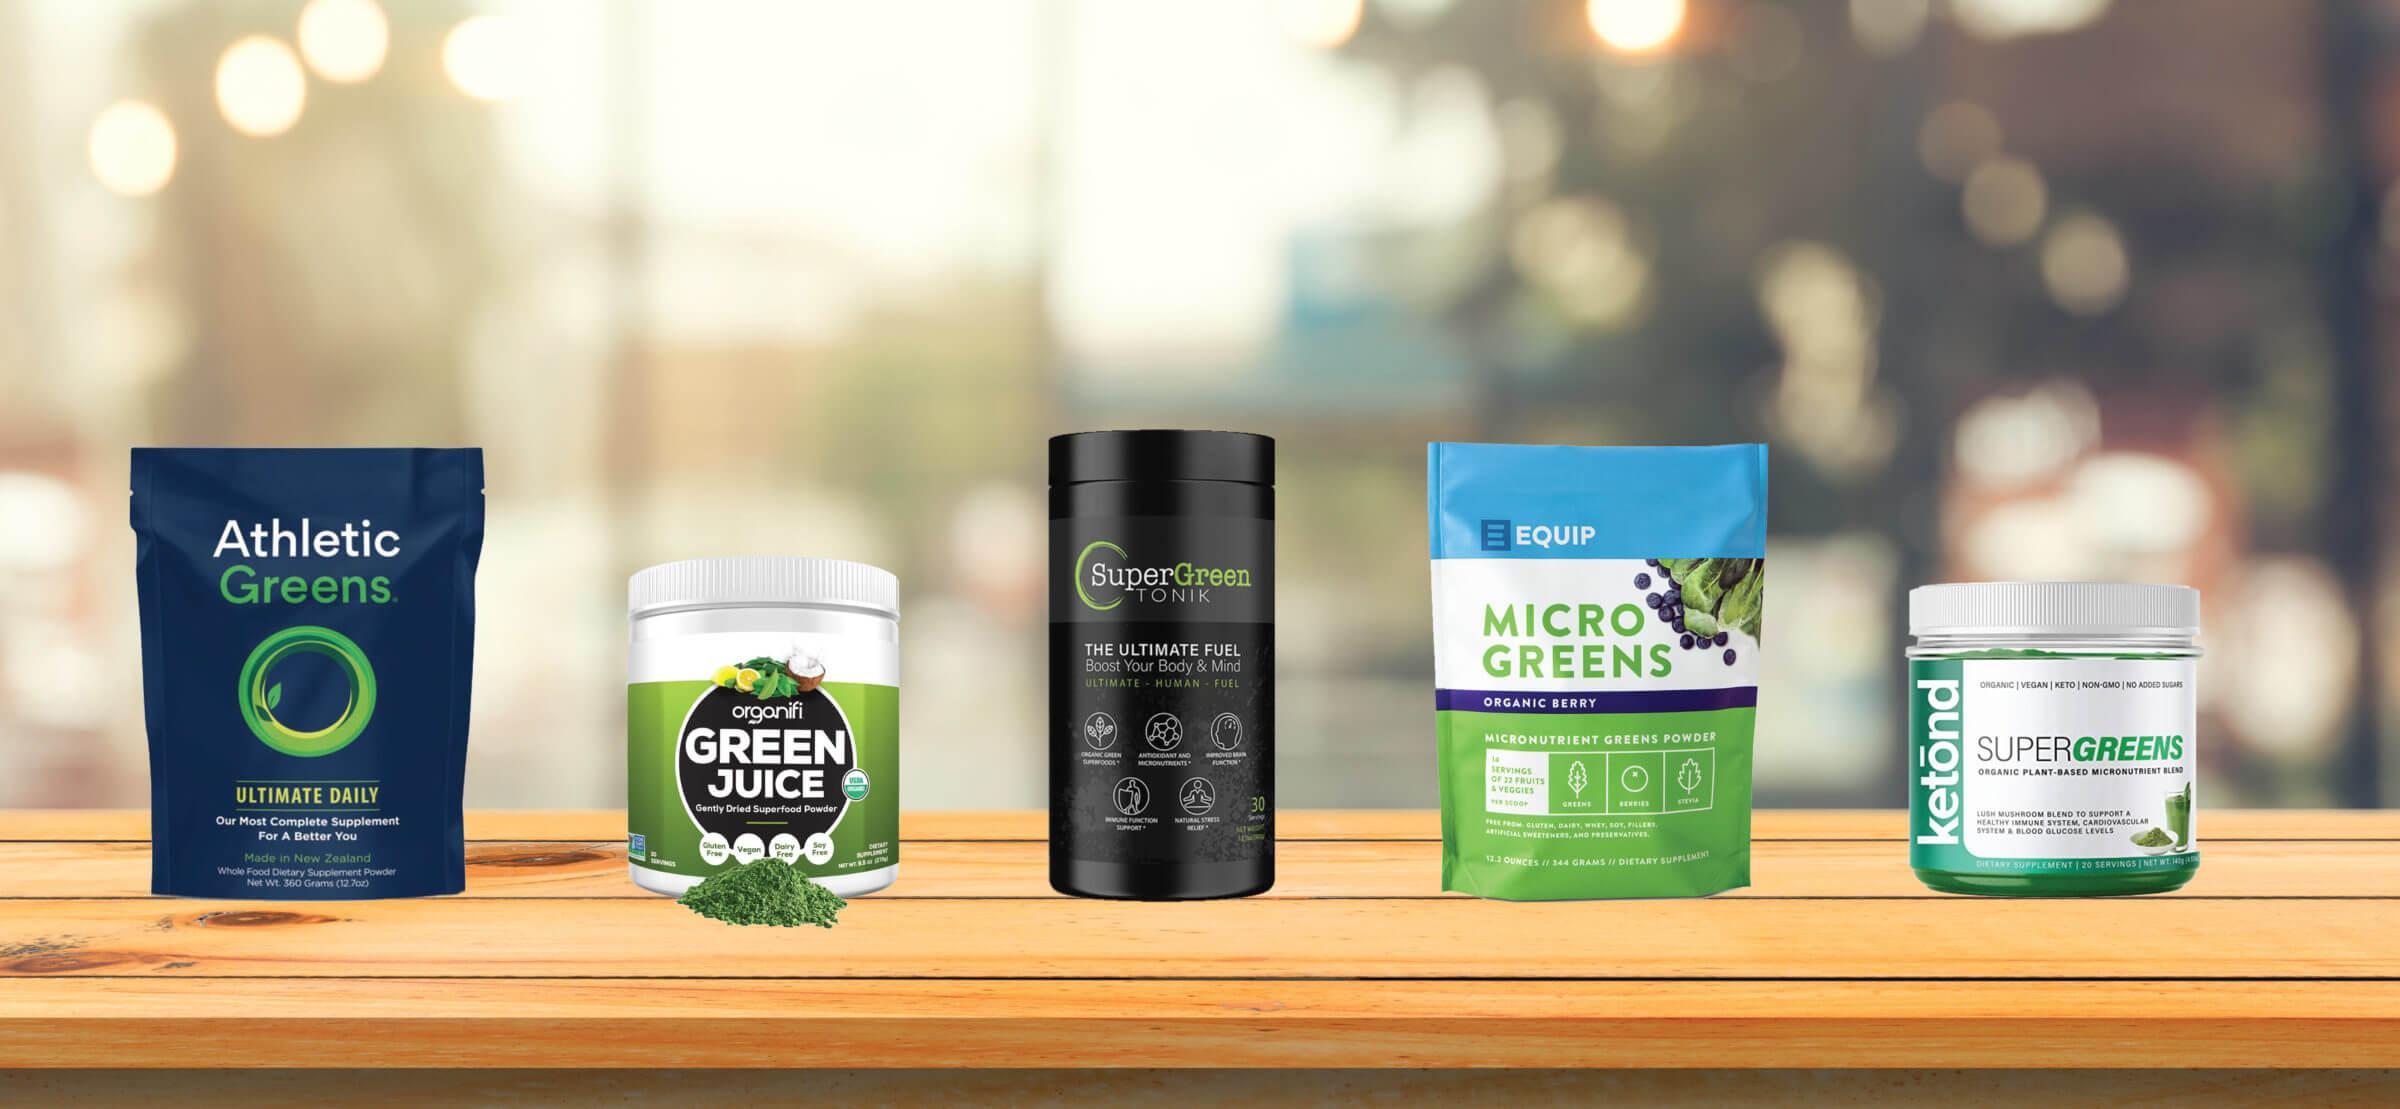 Best Superfood Green Powder in 2020